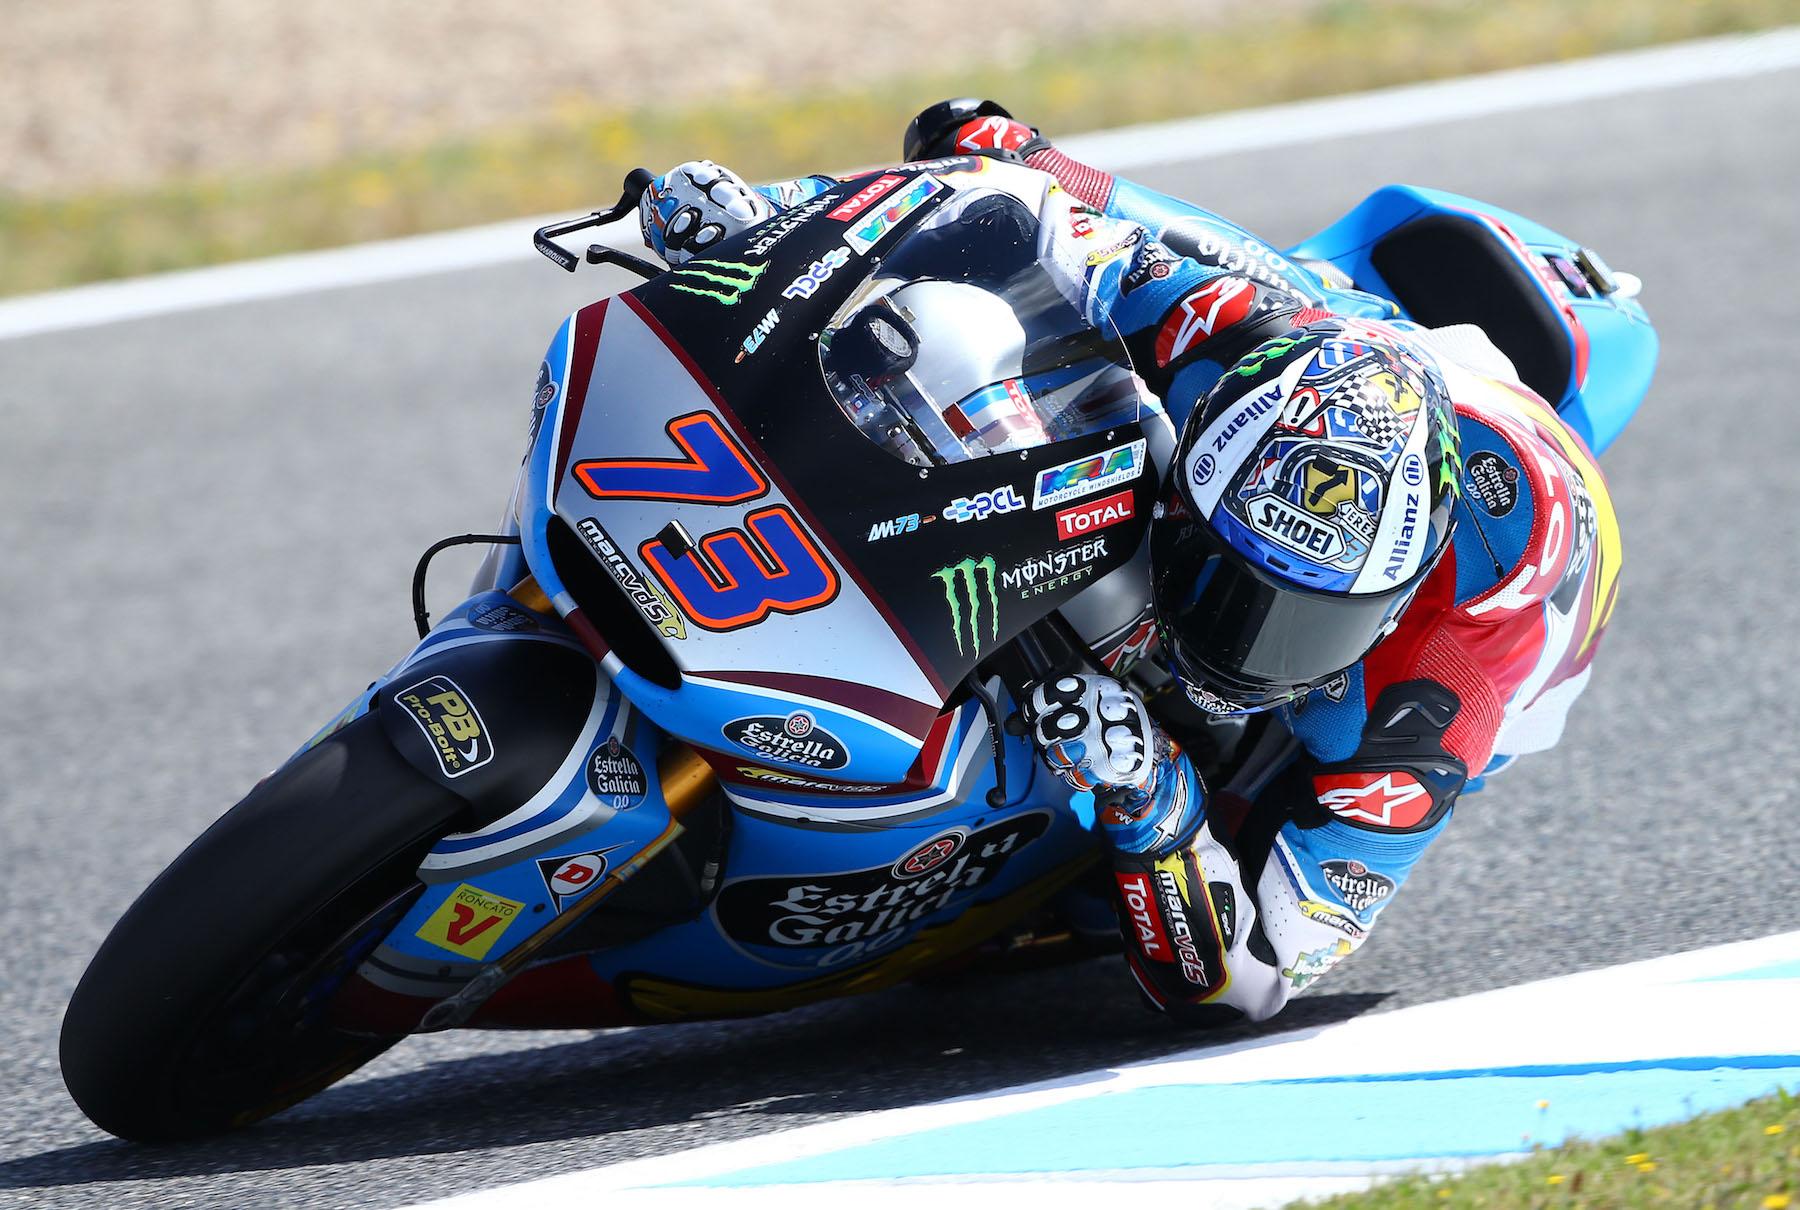 Álex Márquez arrasa en Moto2 con abandono de Franco Morbidelli